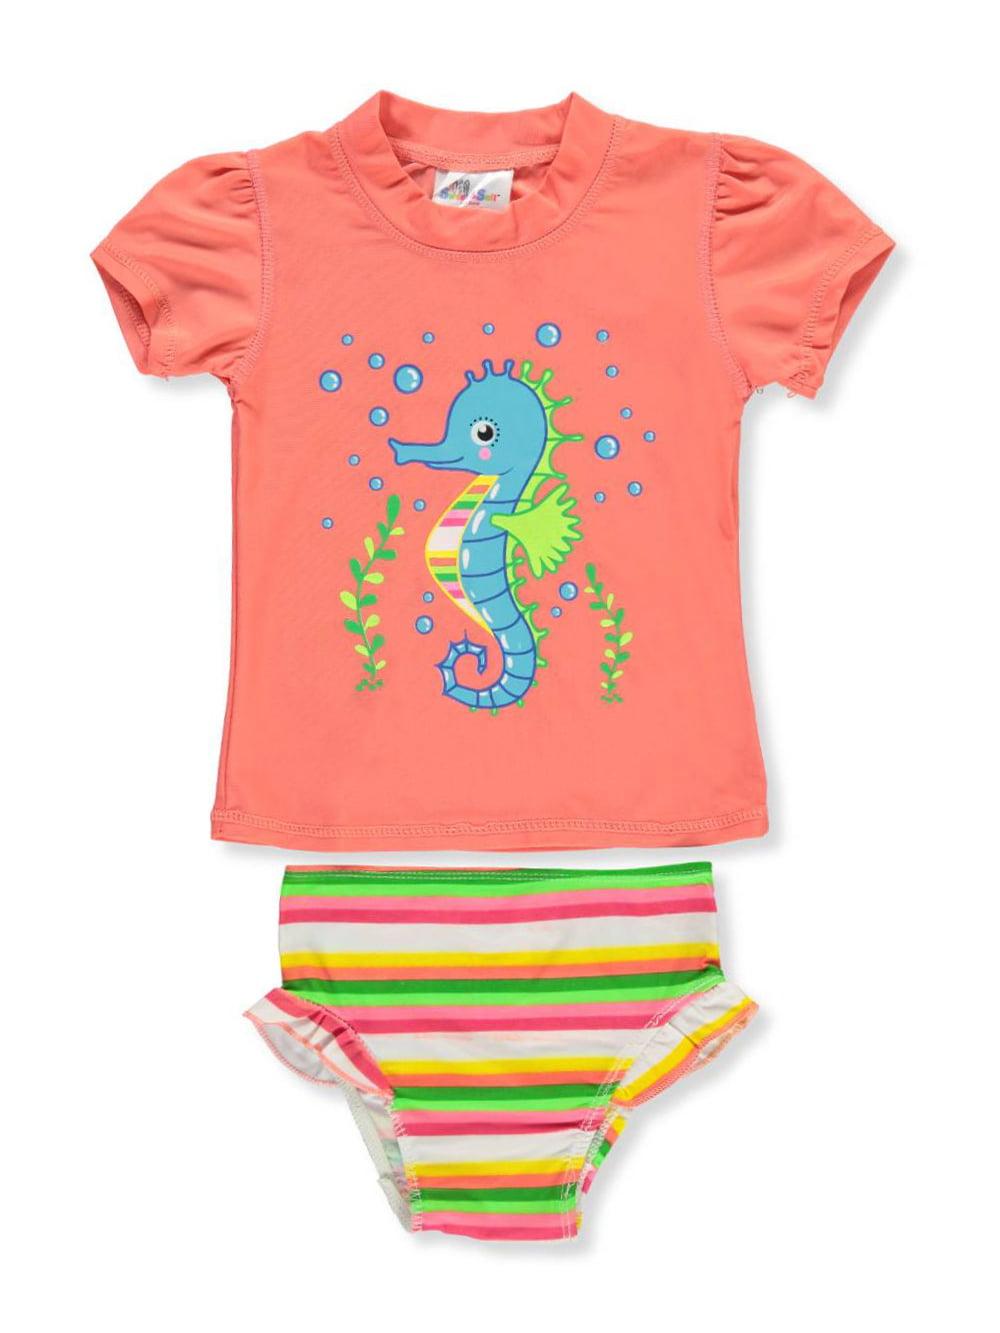 dd5c88466 Baby Girl Shirt Patterns - DREAMWORKS